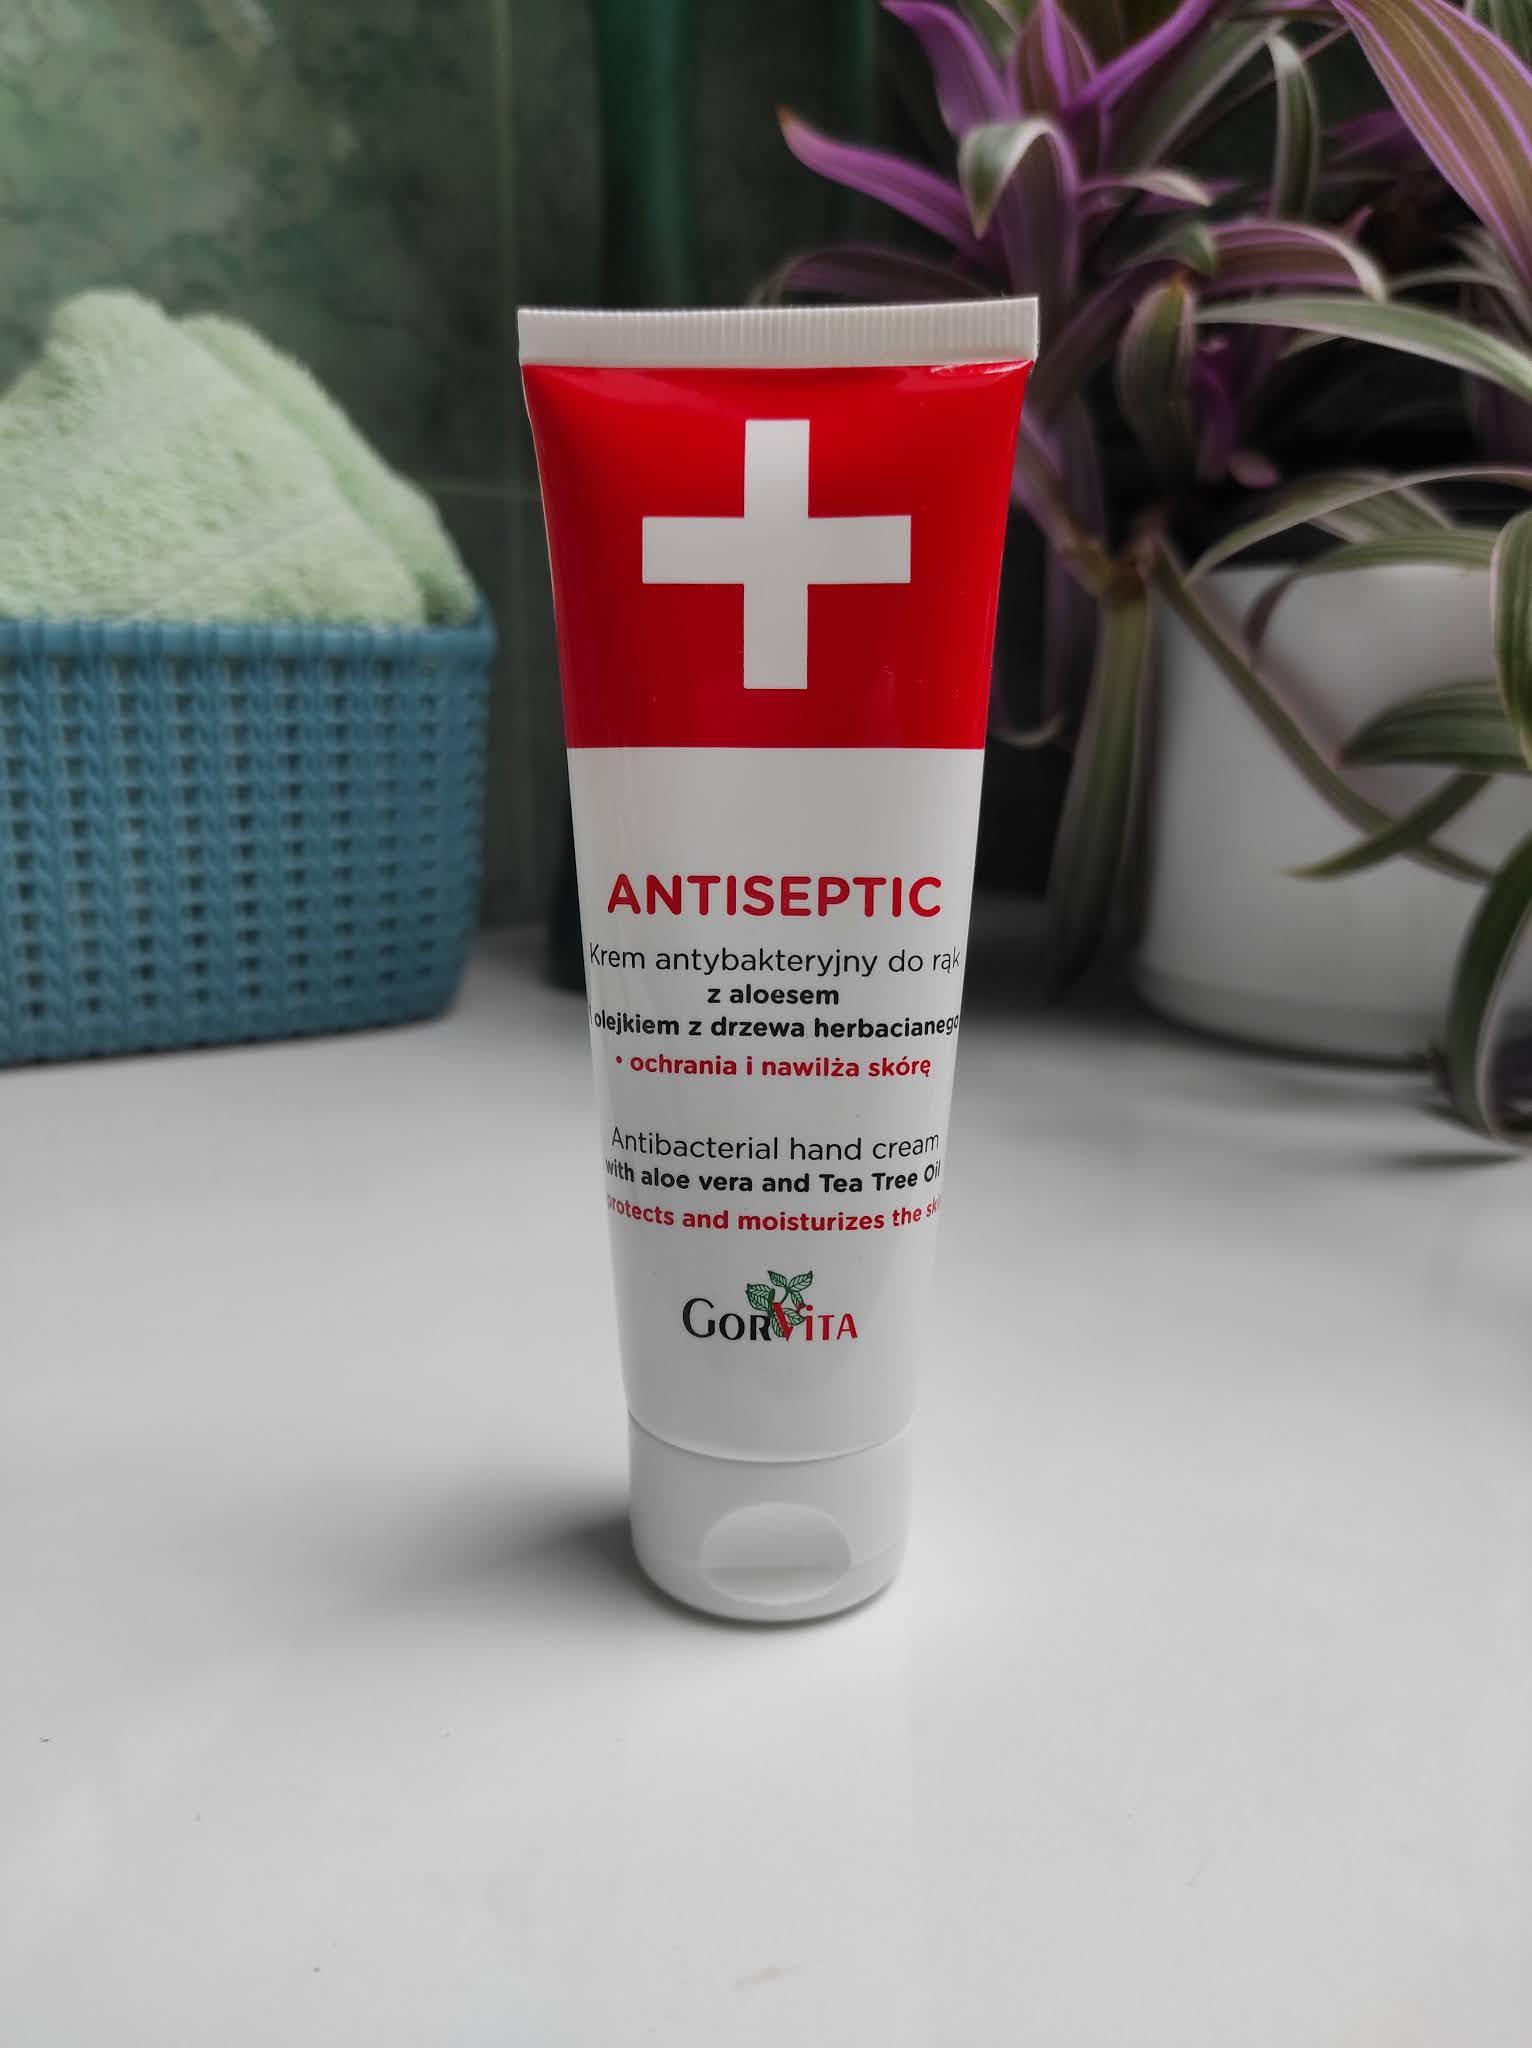 Antiseptic - produkty antybakteryjne do rąk z aloesem i alantoiną